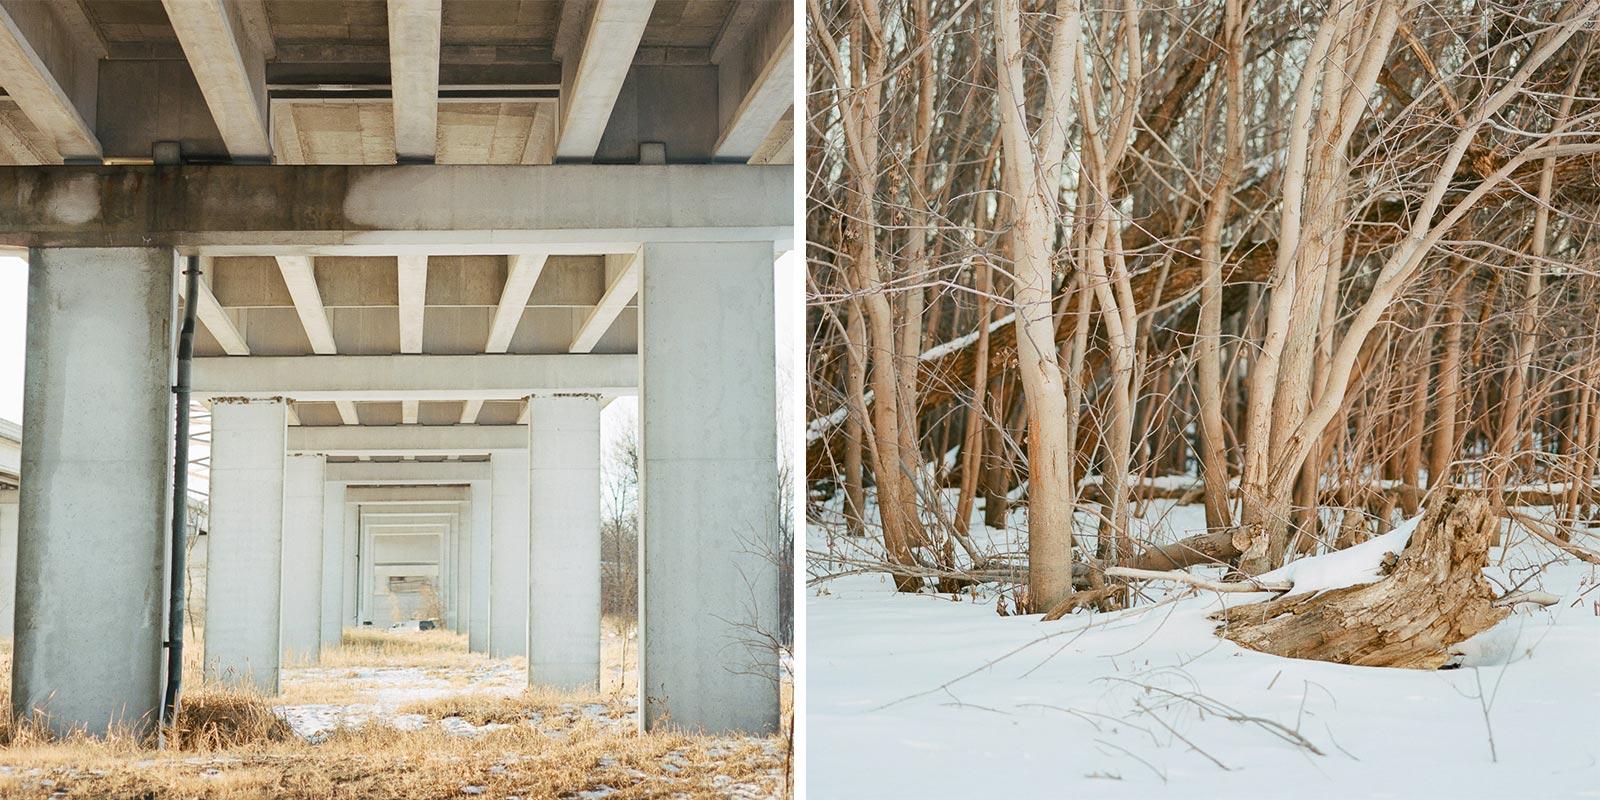 minnesota-winter-landscape-photography-05.jpg